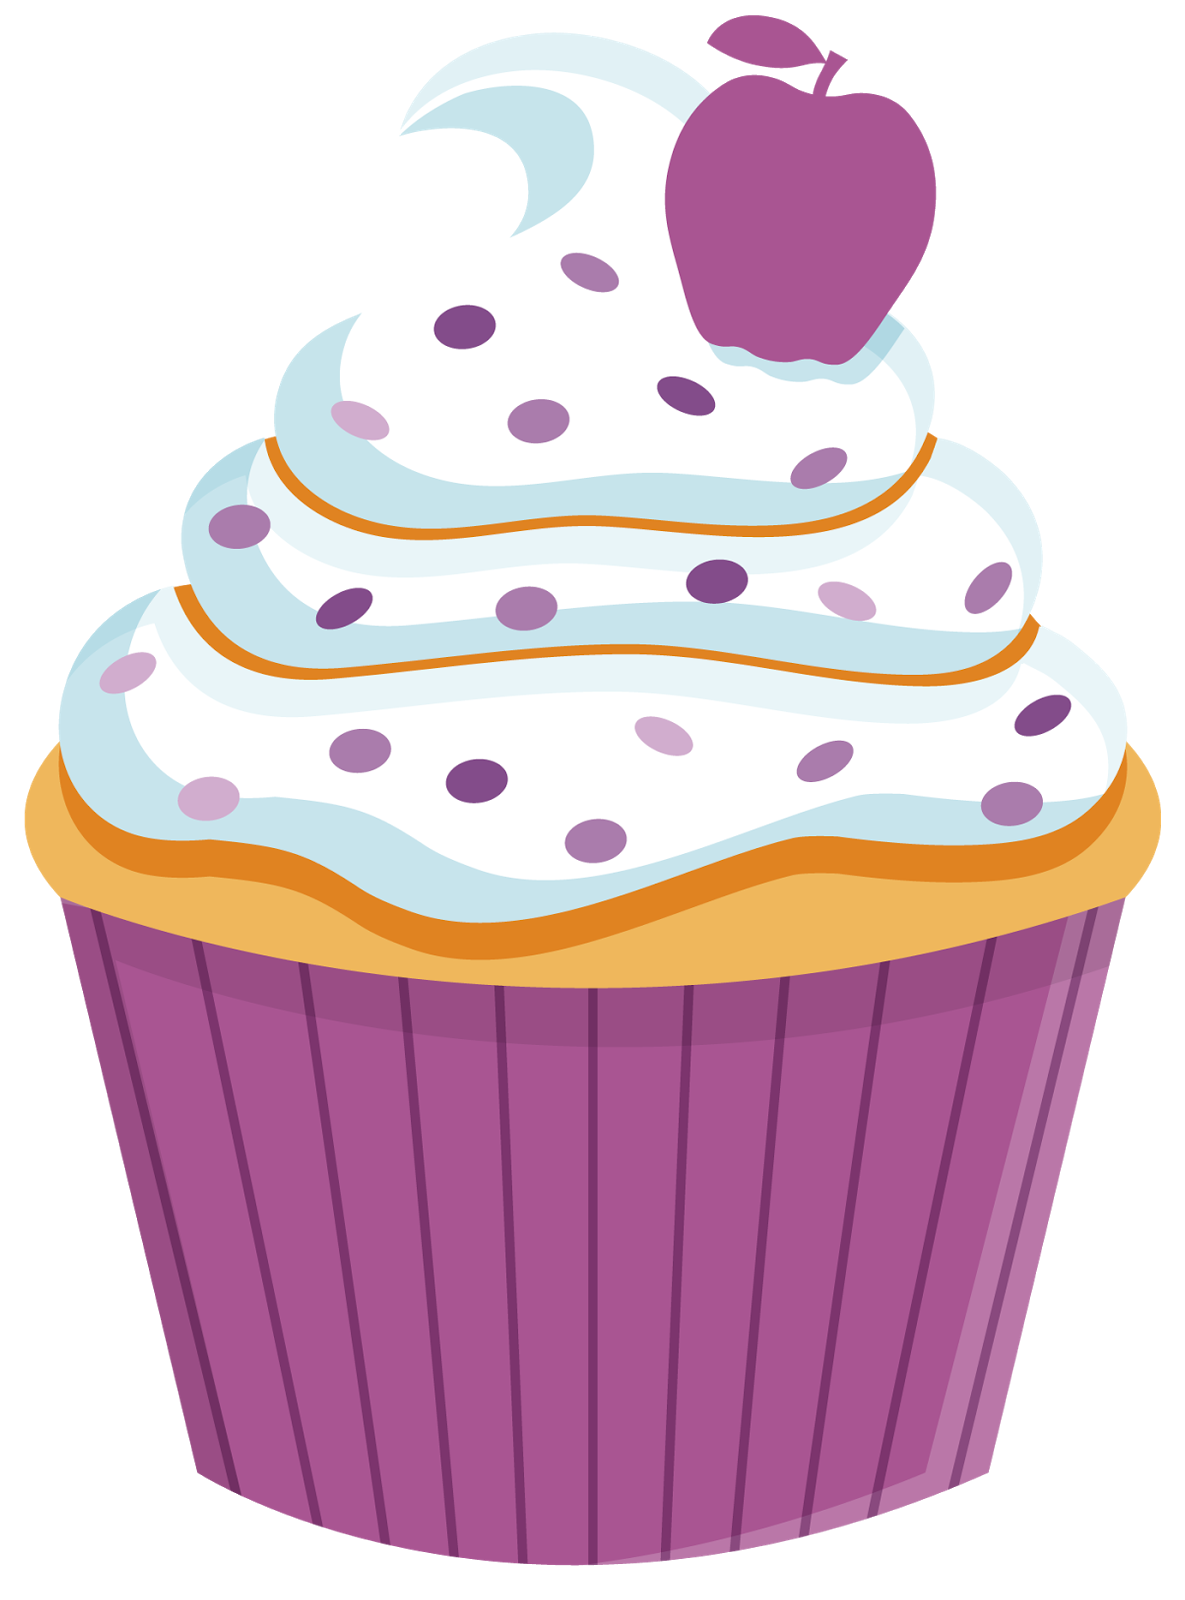 sorte no amor: cupcake cute